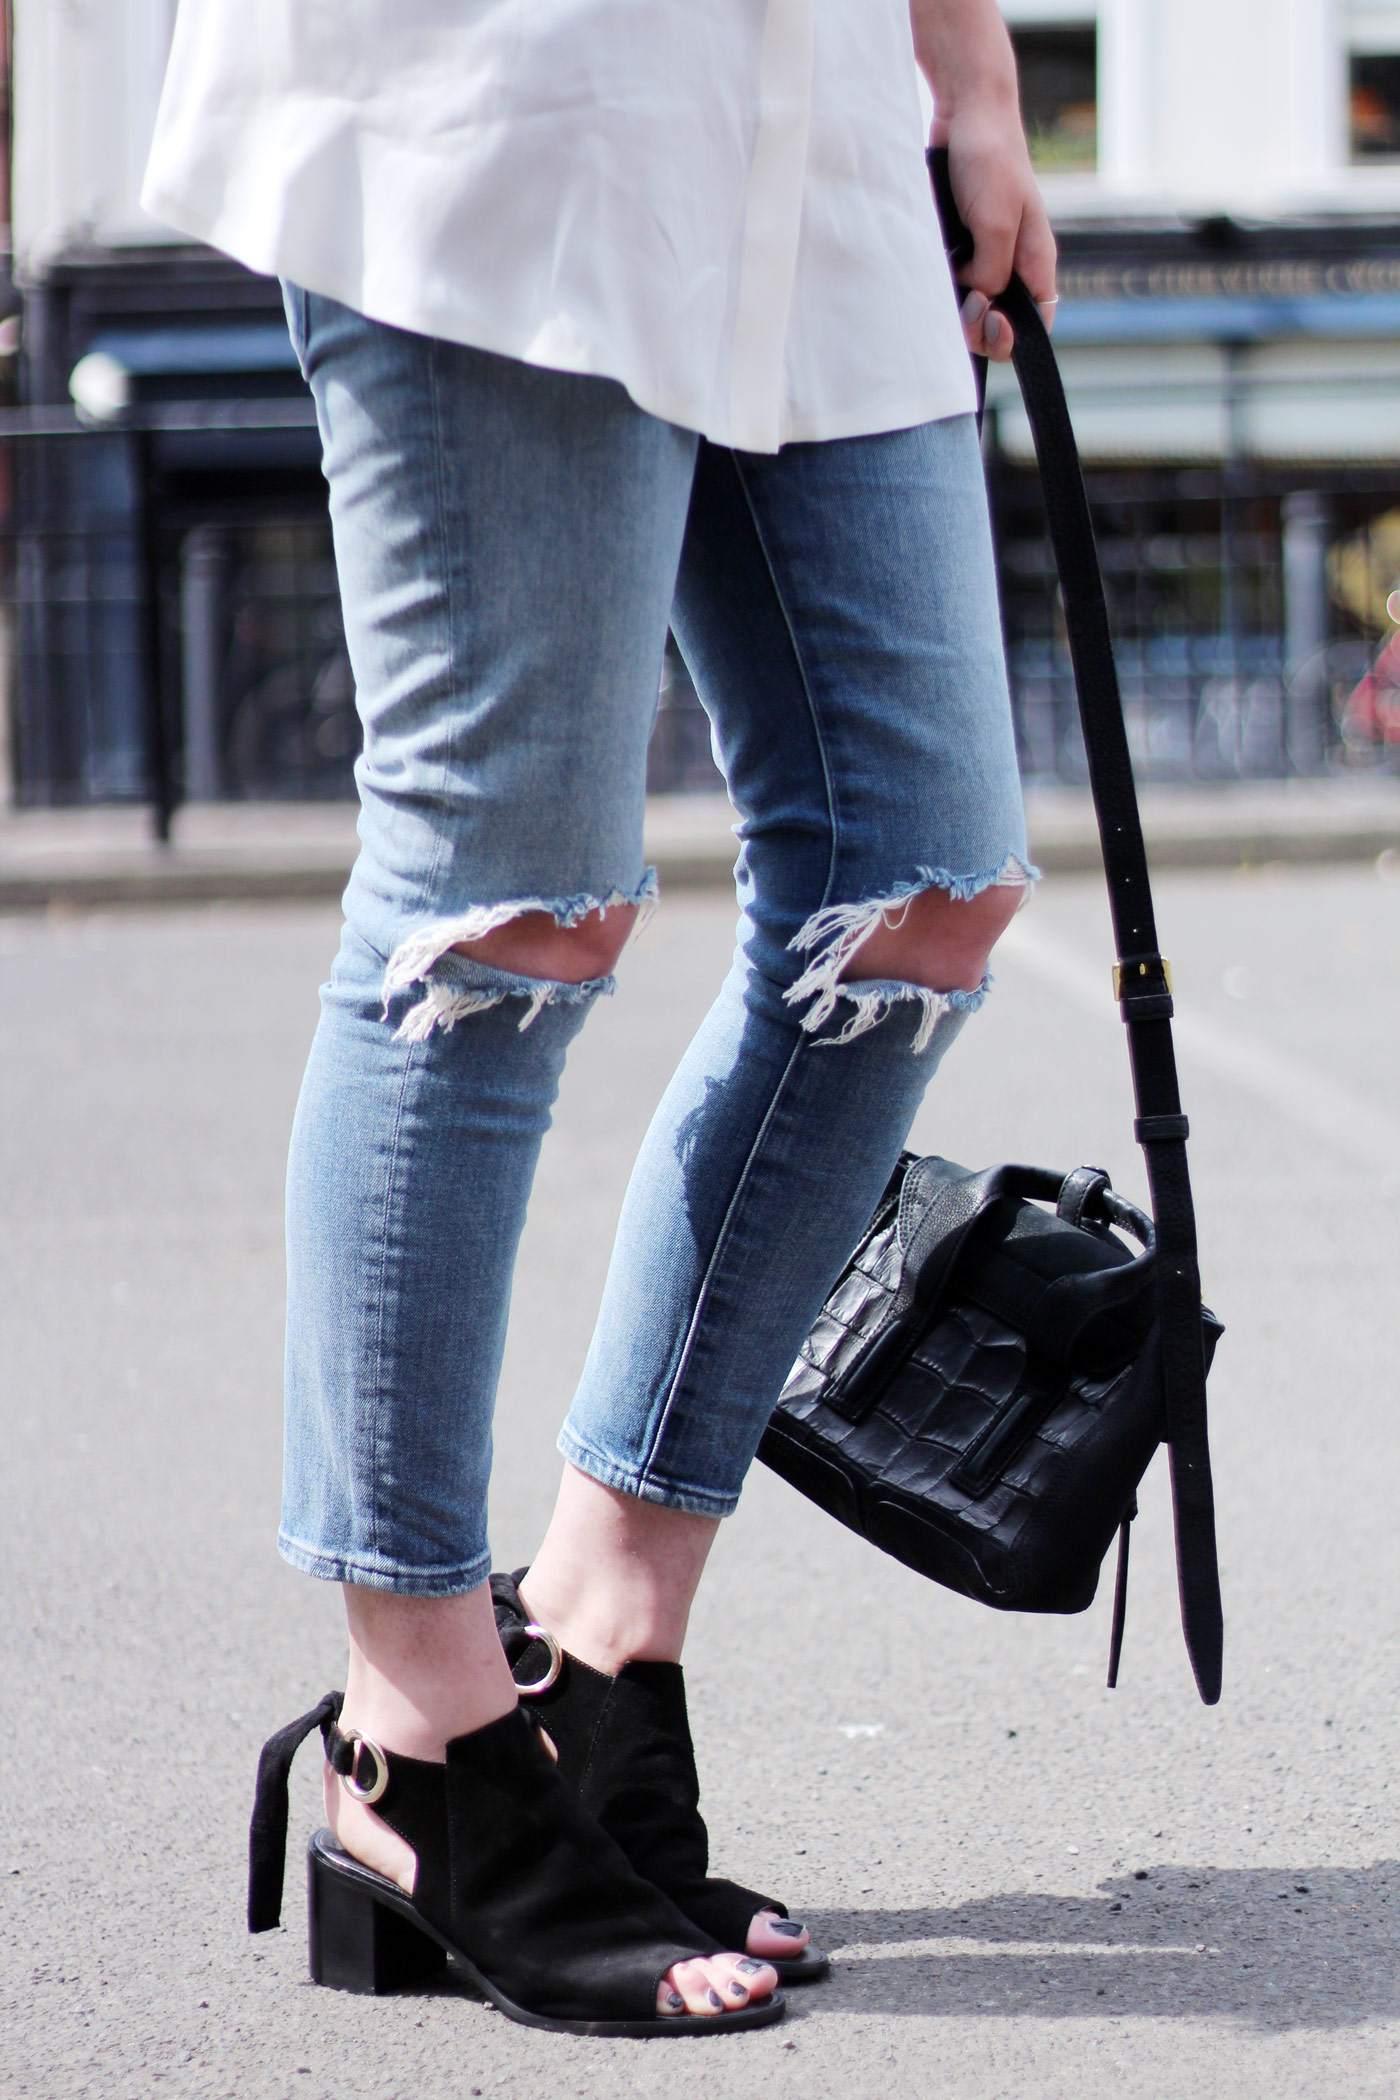 kurt-geiger-suede-peep-toe-boots-7FAM-jeans-COS-white-shirt-phillip-lim-pashli-mini-10